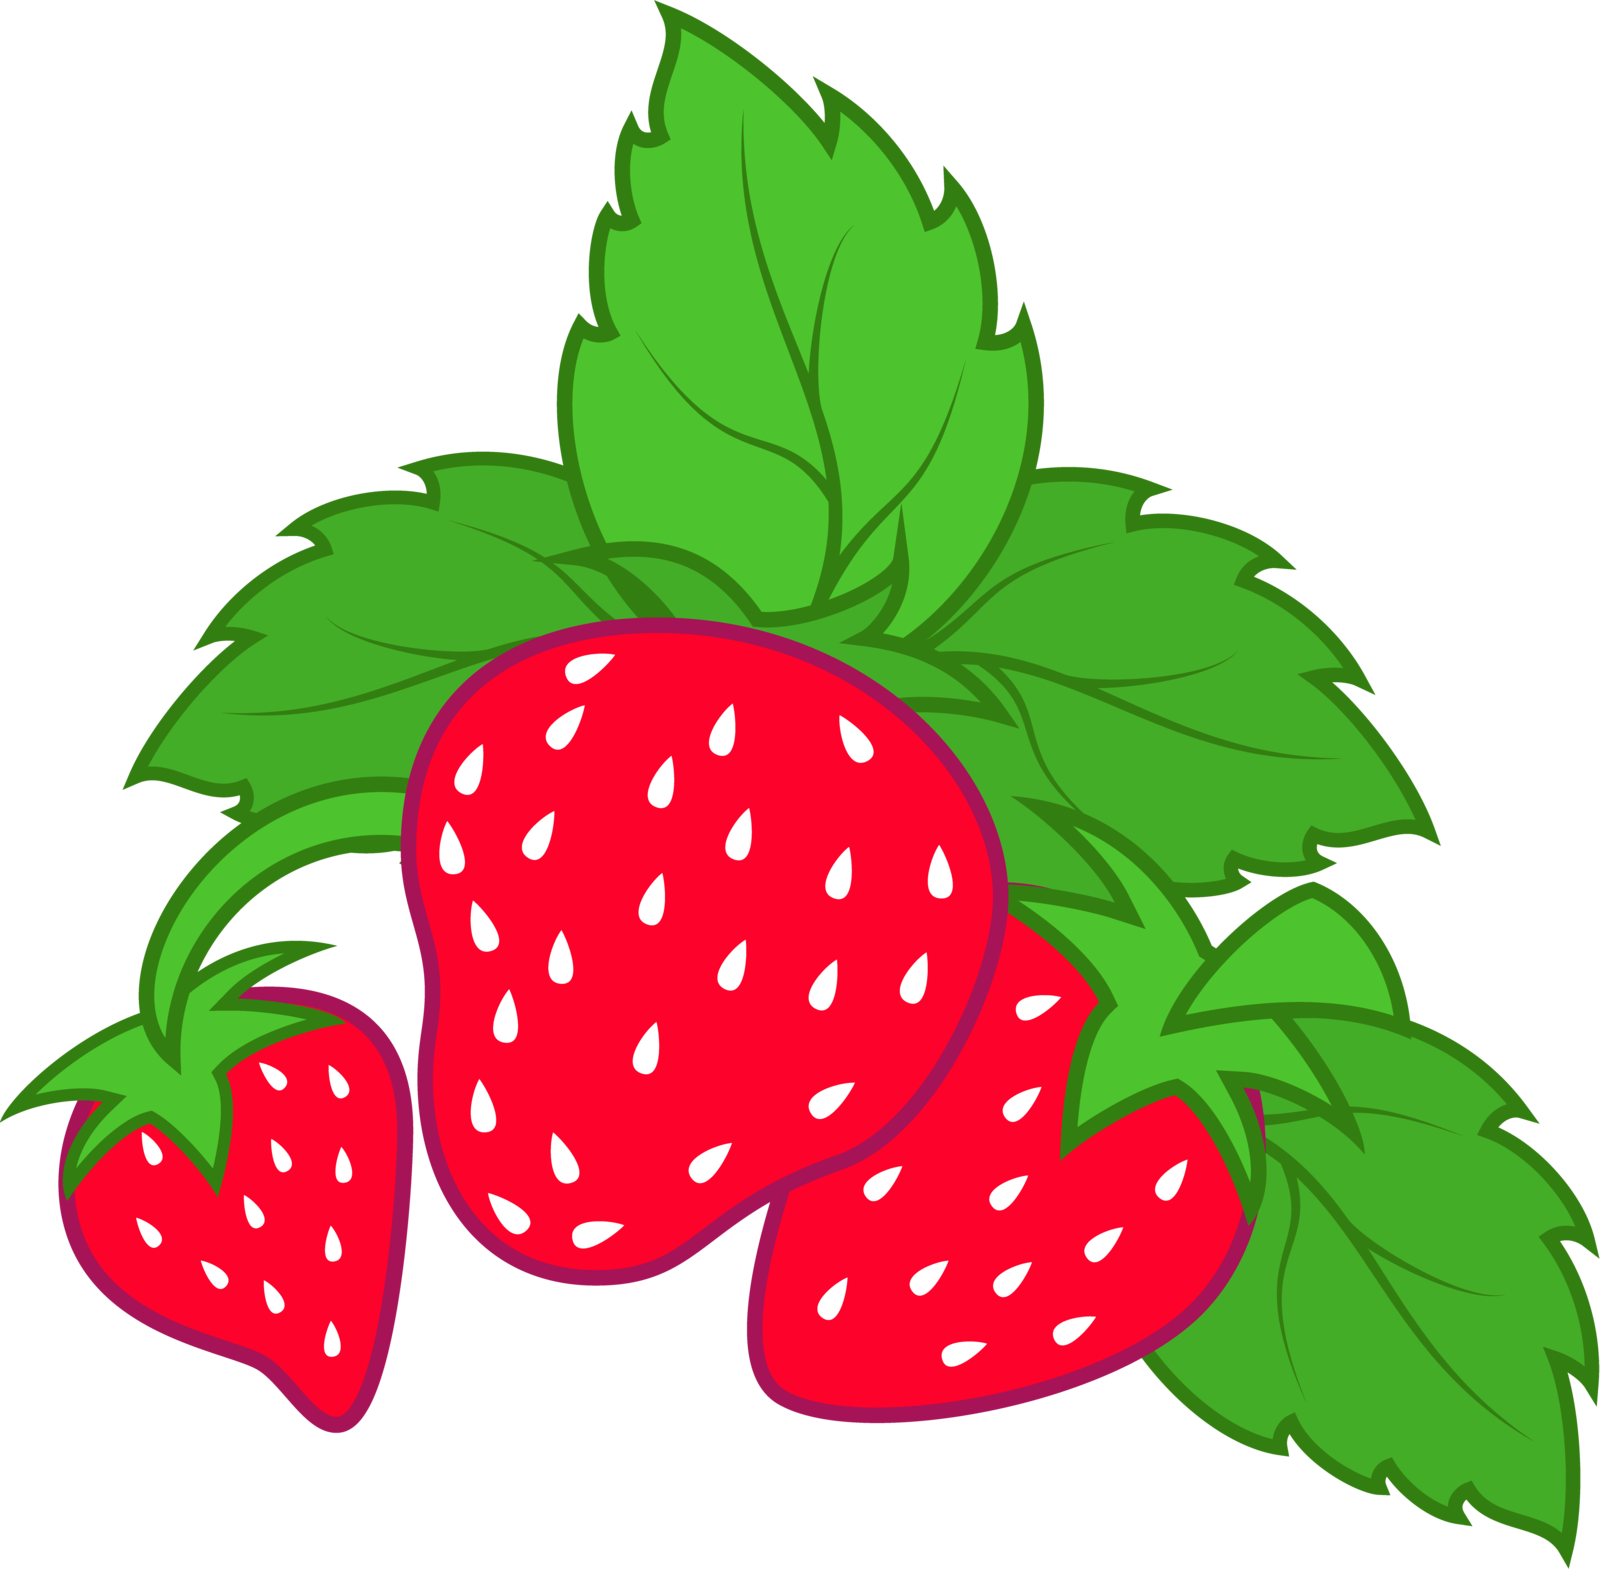 Strawberries clipart strawberry patch. Strawberriesberries explore on deviantart